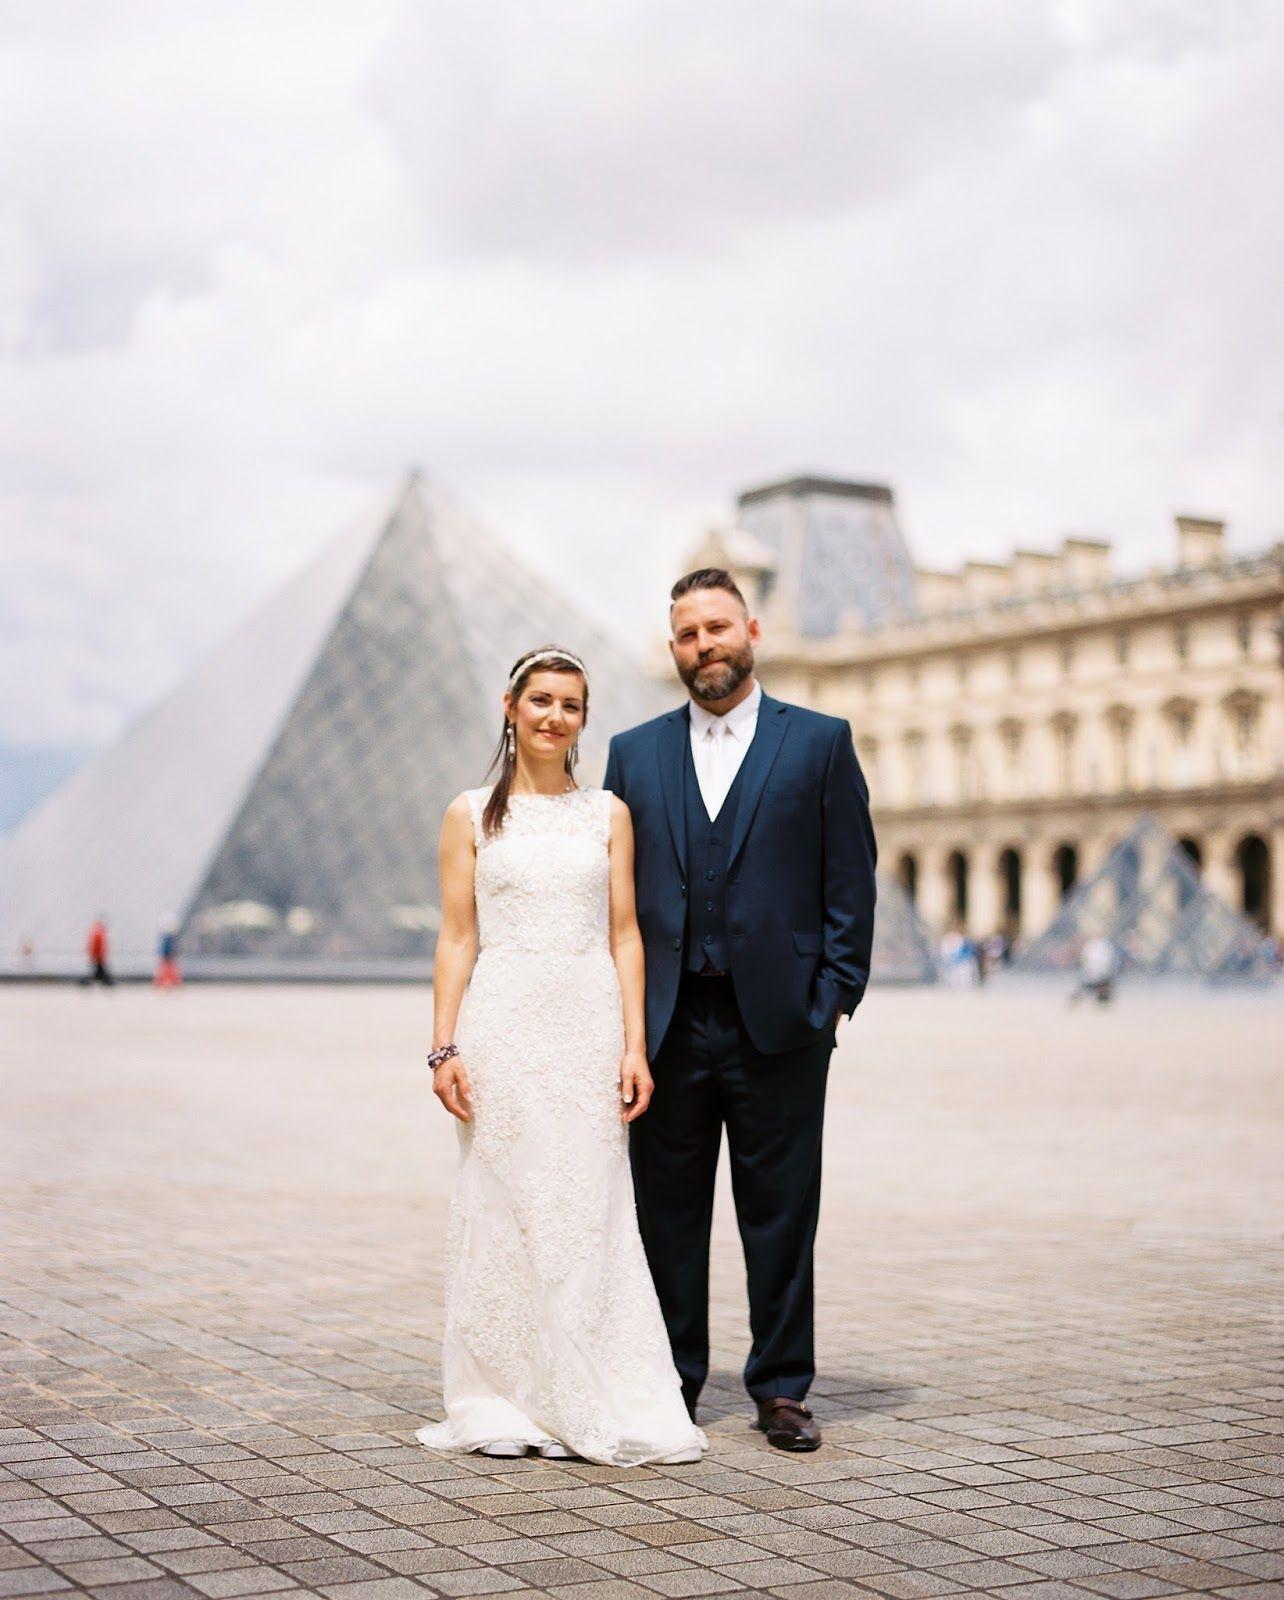 Paris wedding paris france louvre museum trocodero square white